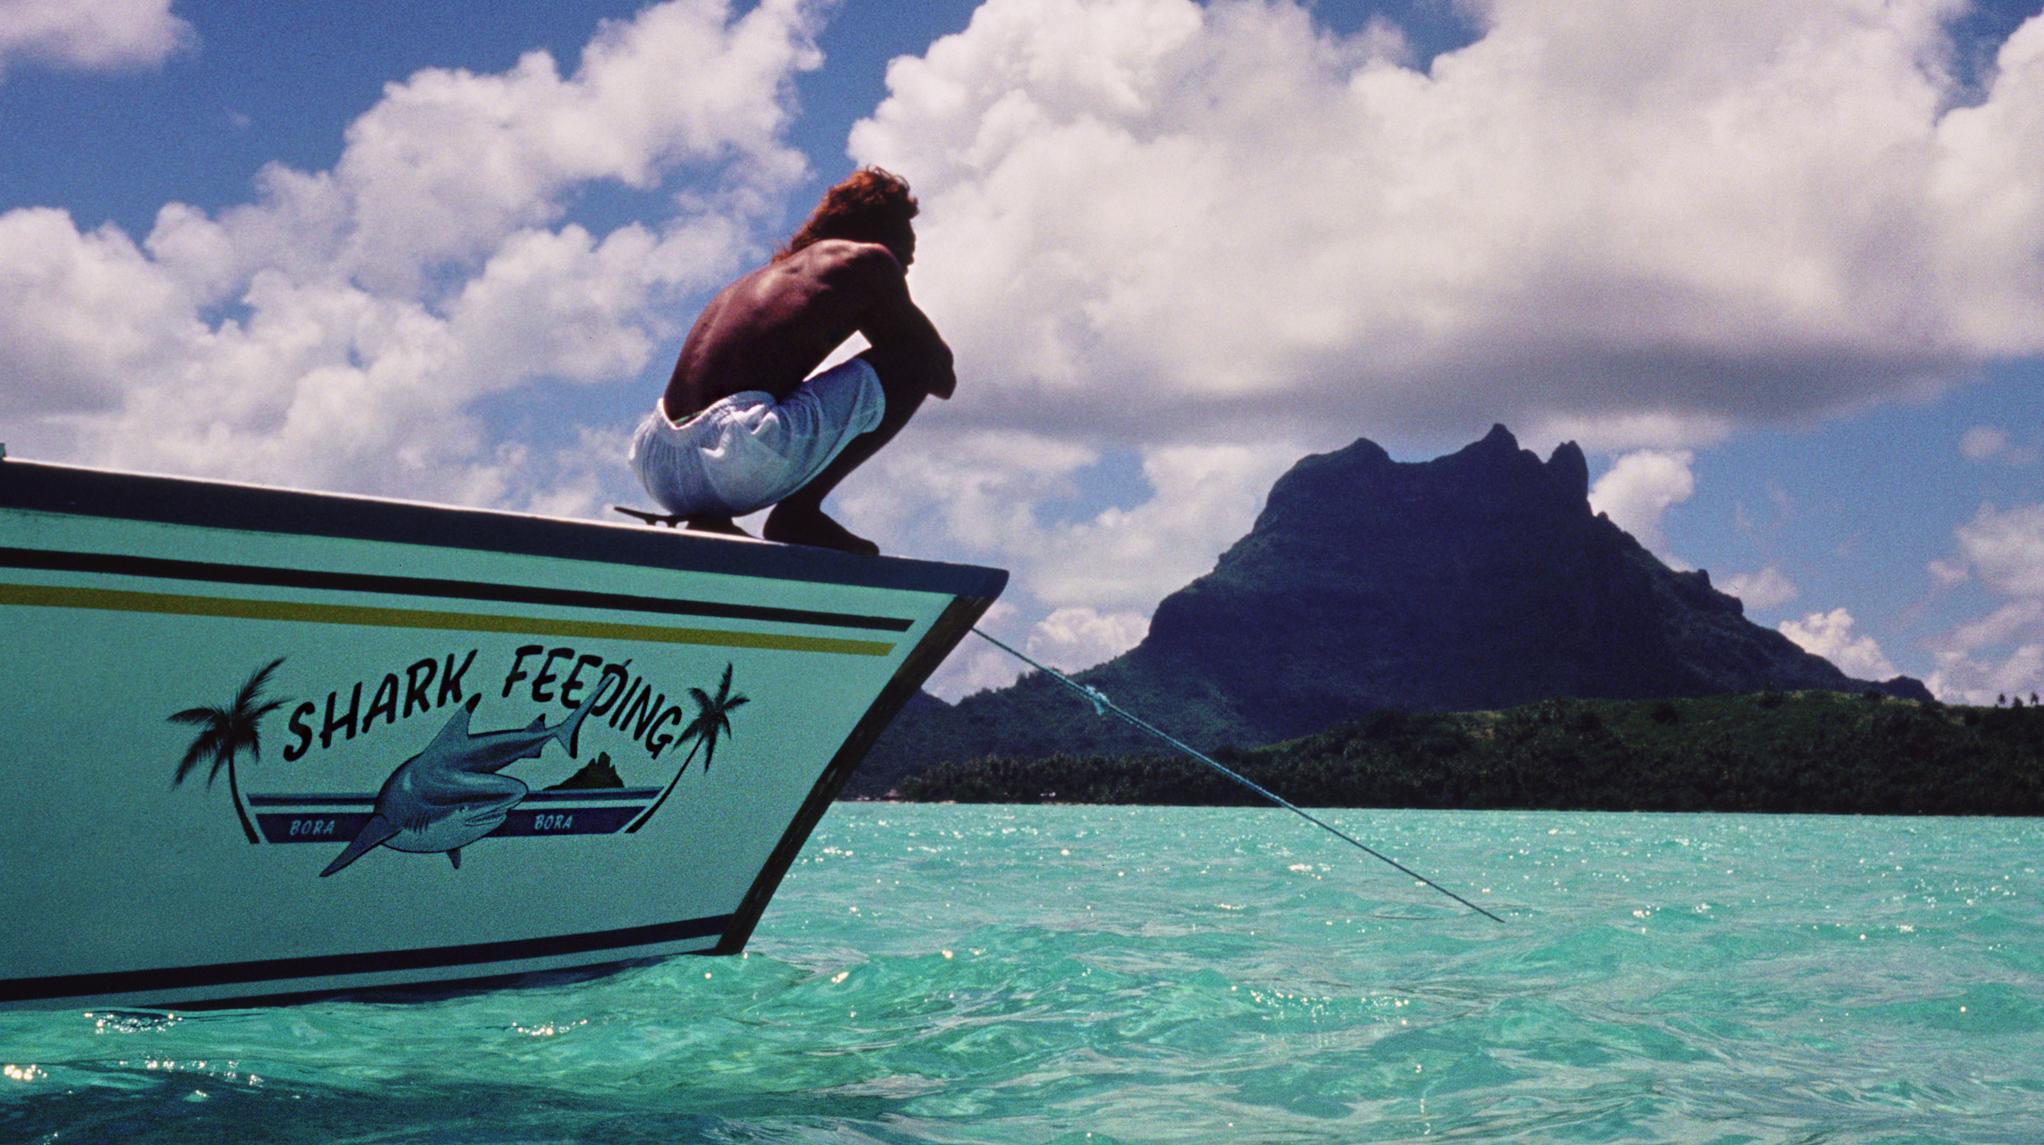 Kimball-Hall-sharkfeeding-Tahiti-cropped.jpg